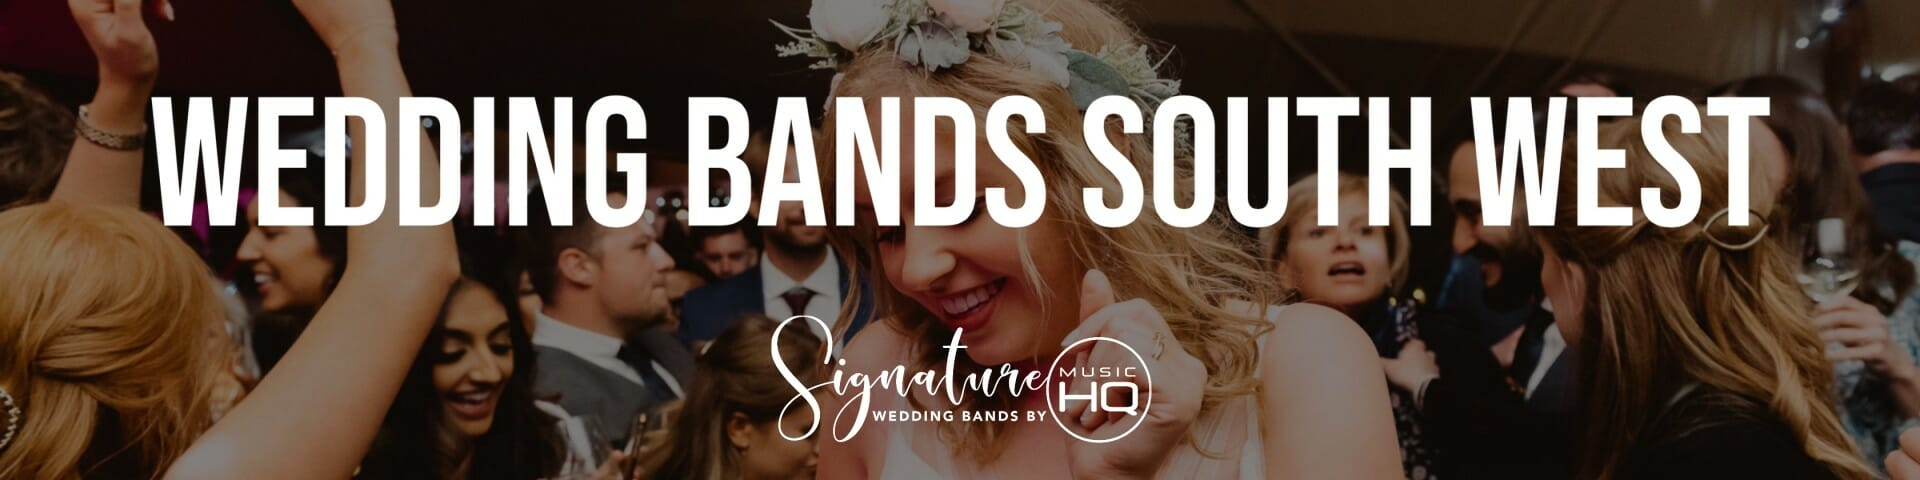 Best wedding bands in the South West. Bristol, Bath, Weston-Super-Mare, UK.